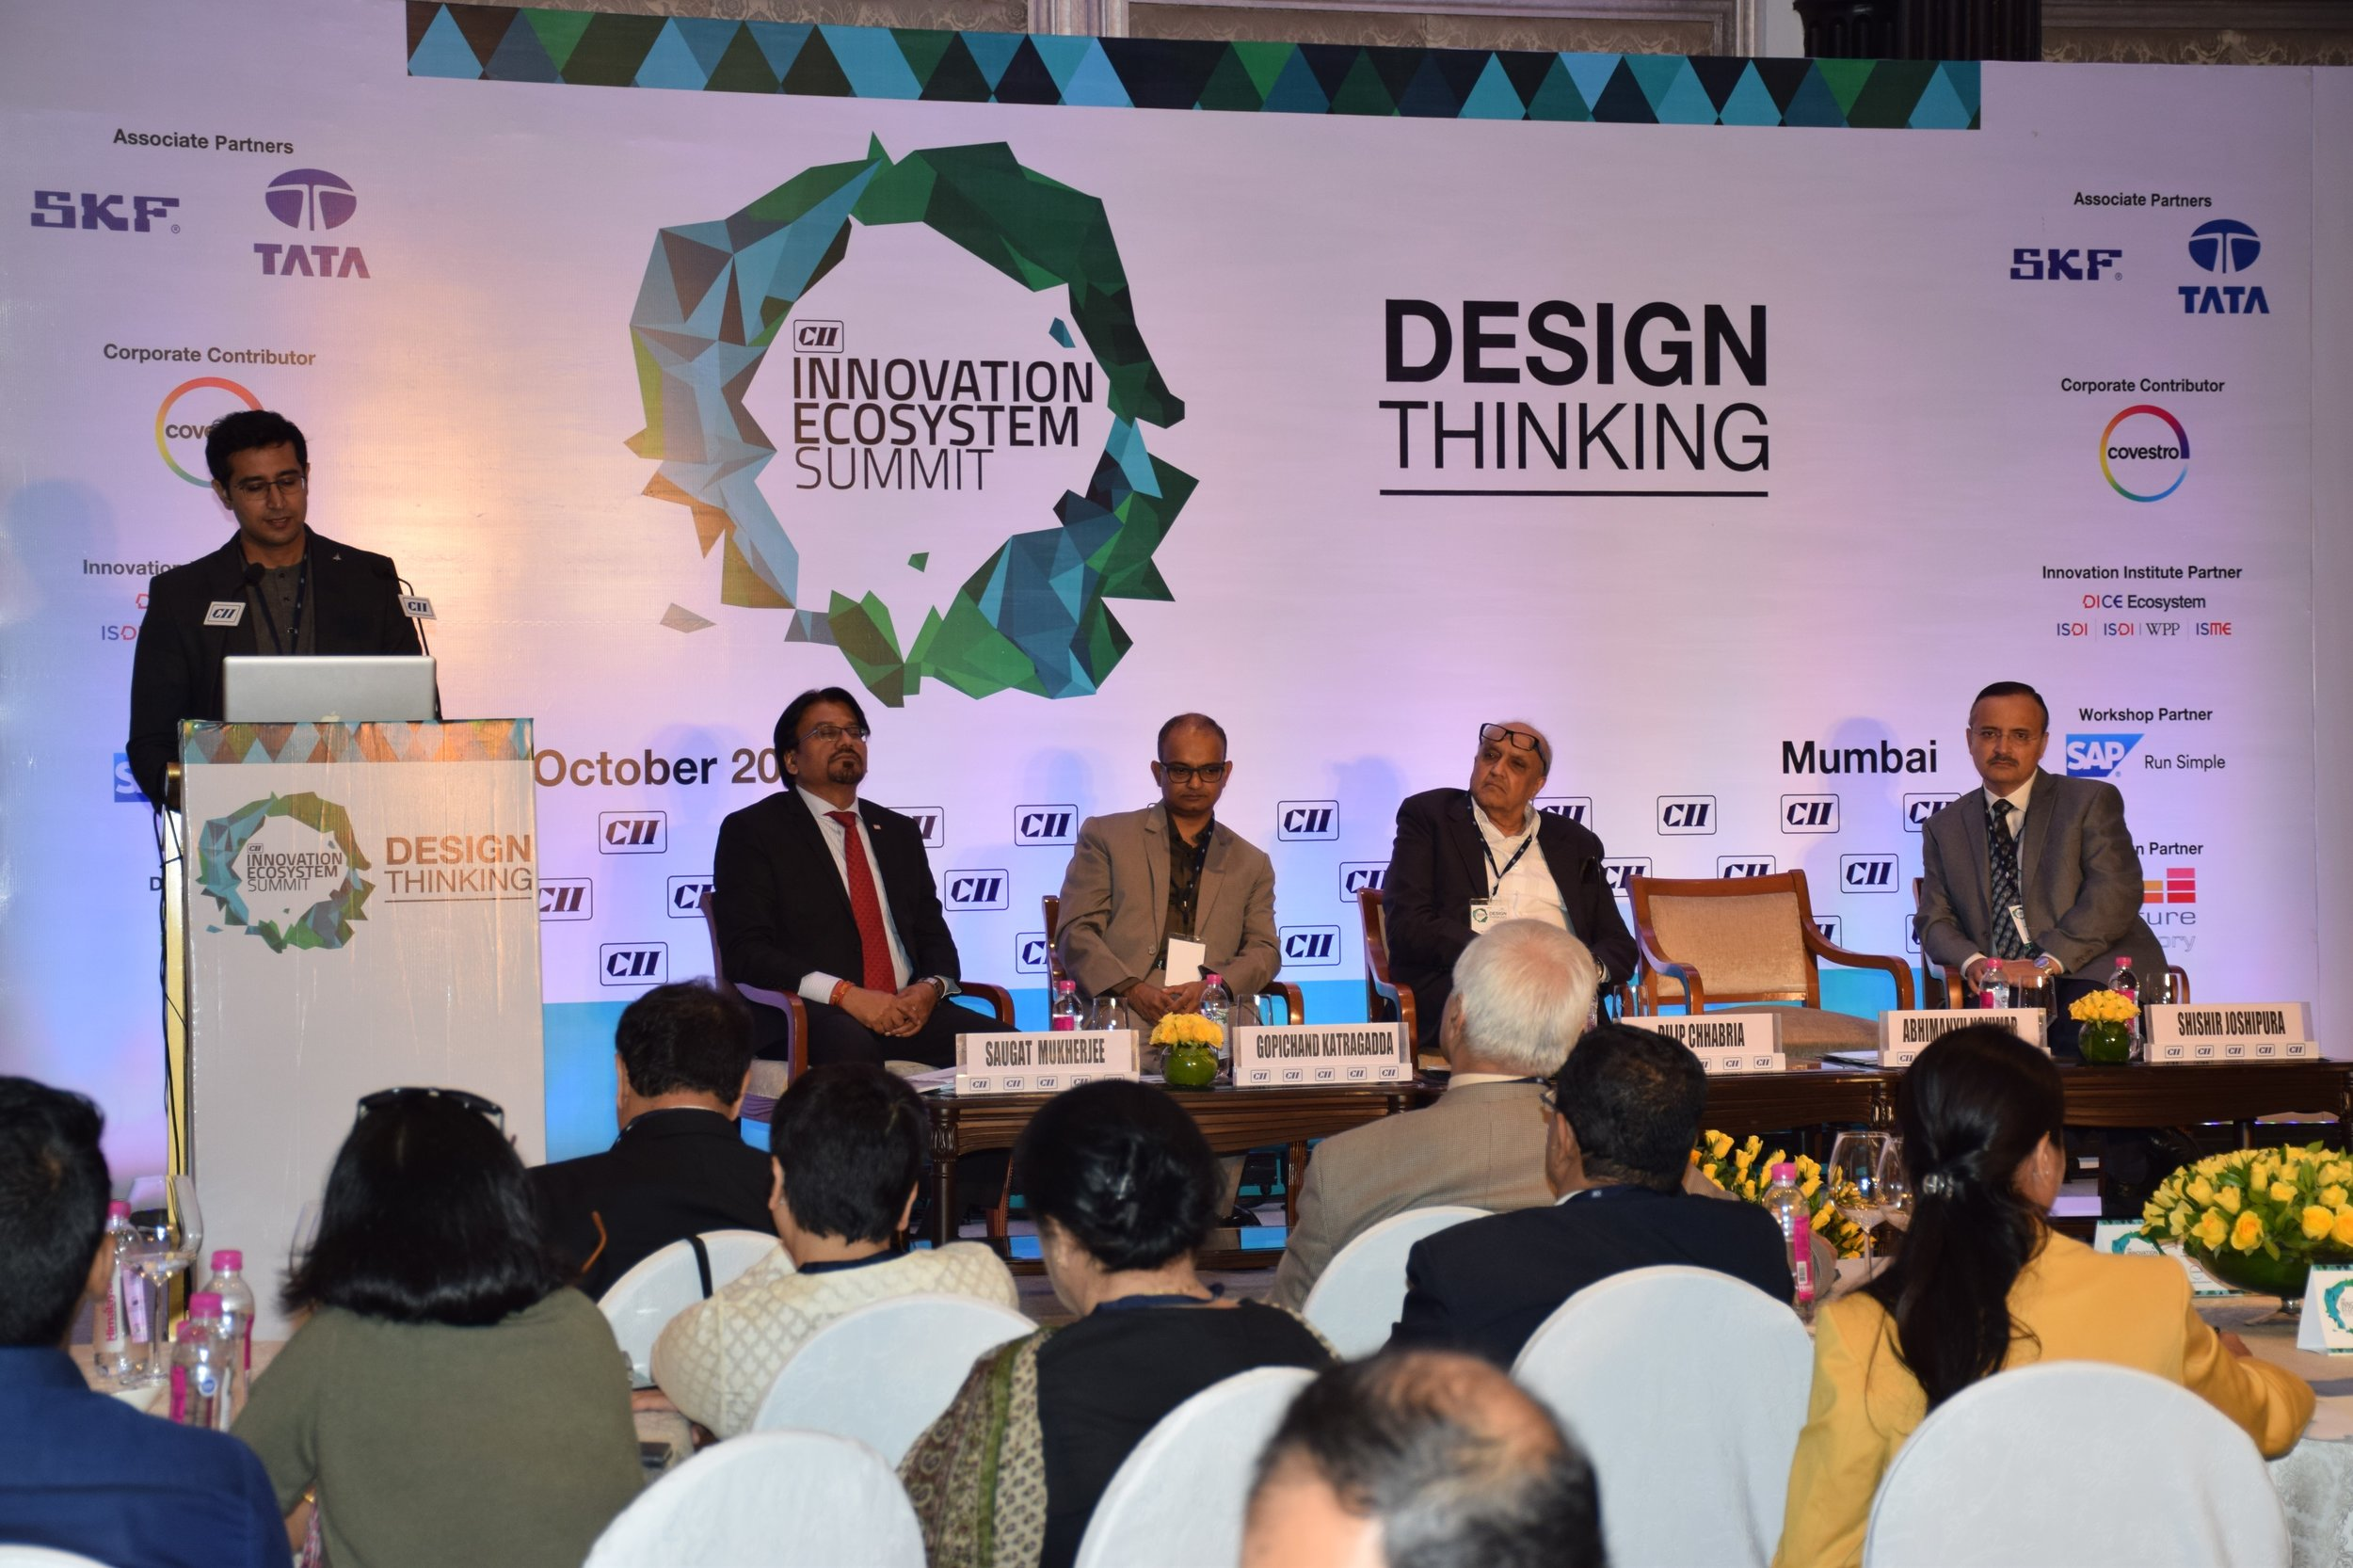 CII Innovation Ecosystem Summit 2017 speaker - Abhimanyu Nohwar - 4.jpg